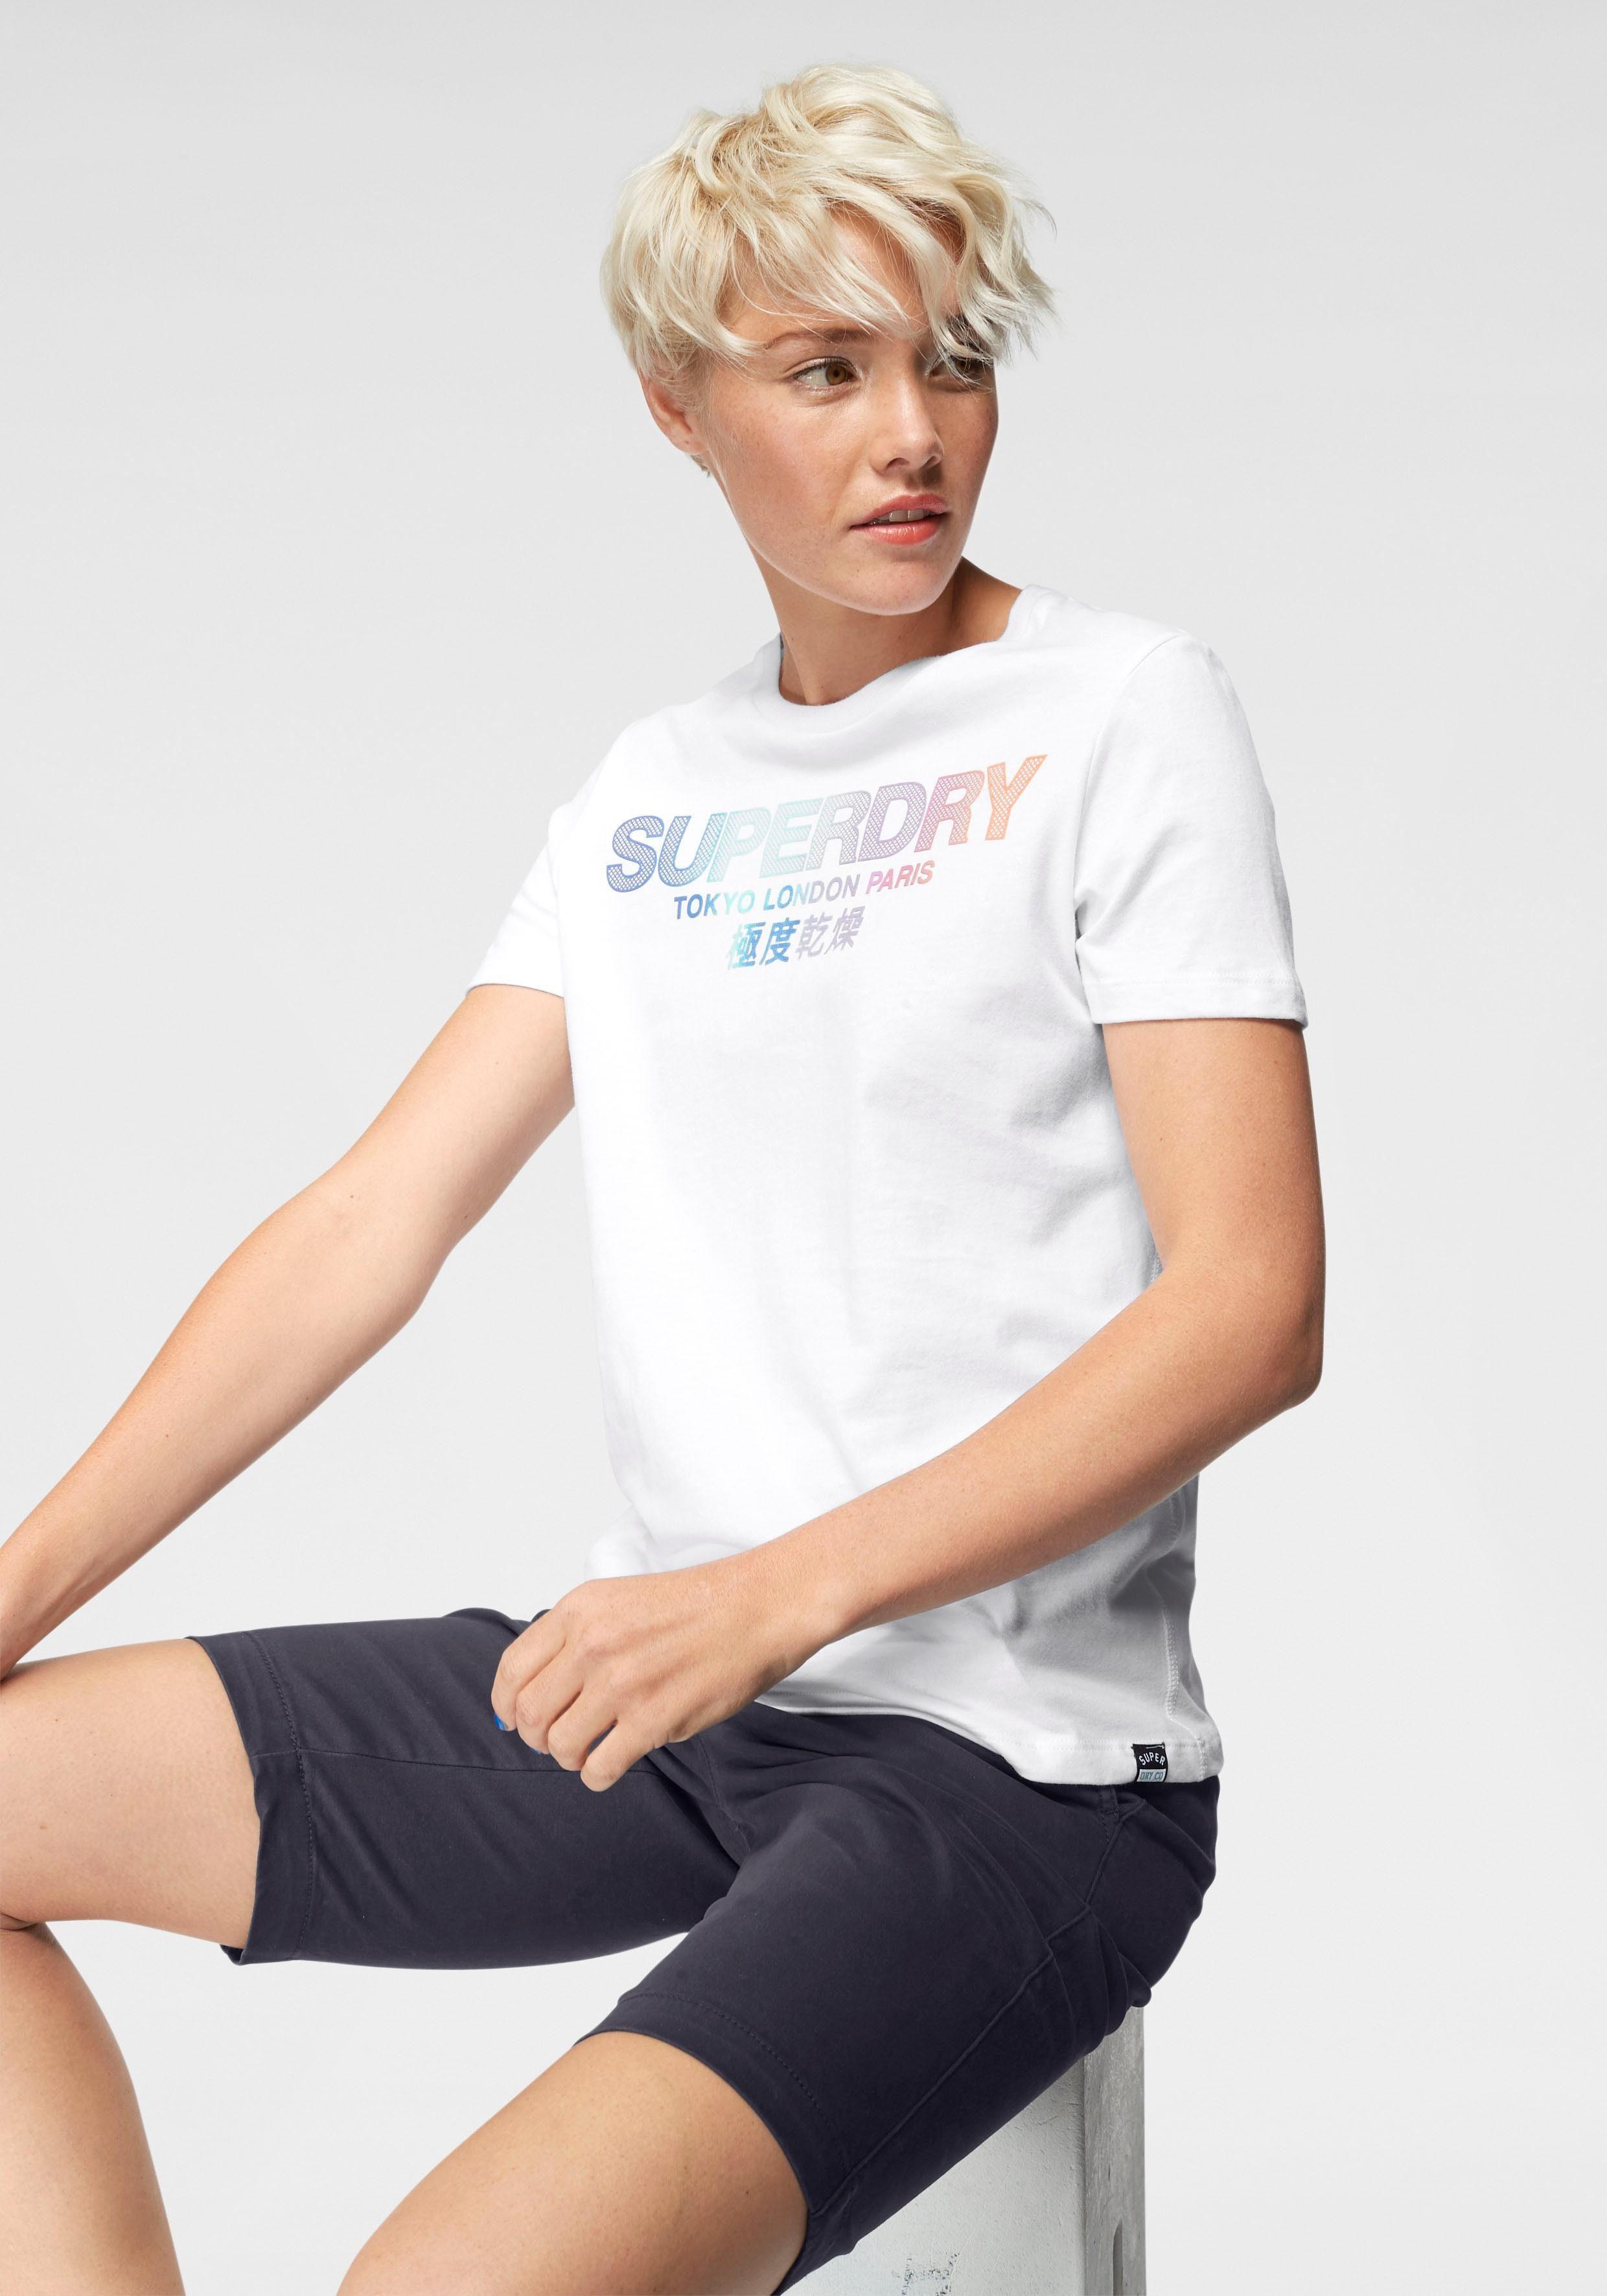 Superdry T-Shirt »CITY NIGHTS OMBRE PUFF ENTRY TEE« mit Rainbow-Logodruck in Netzoptik